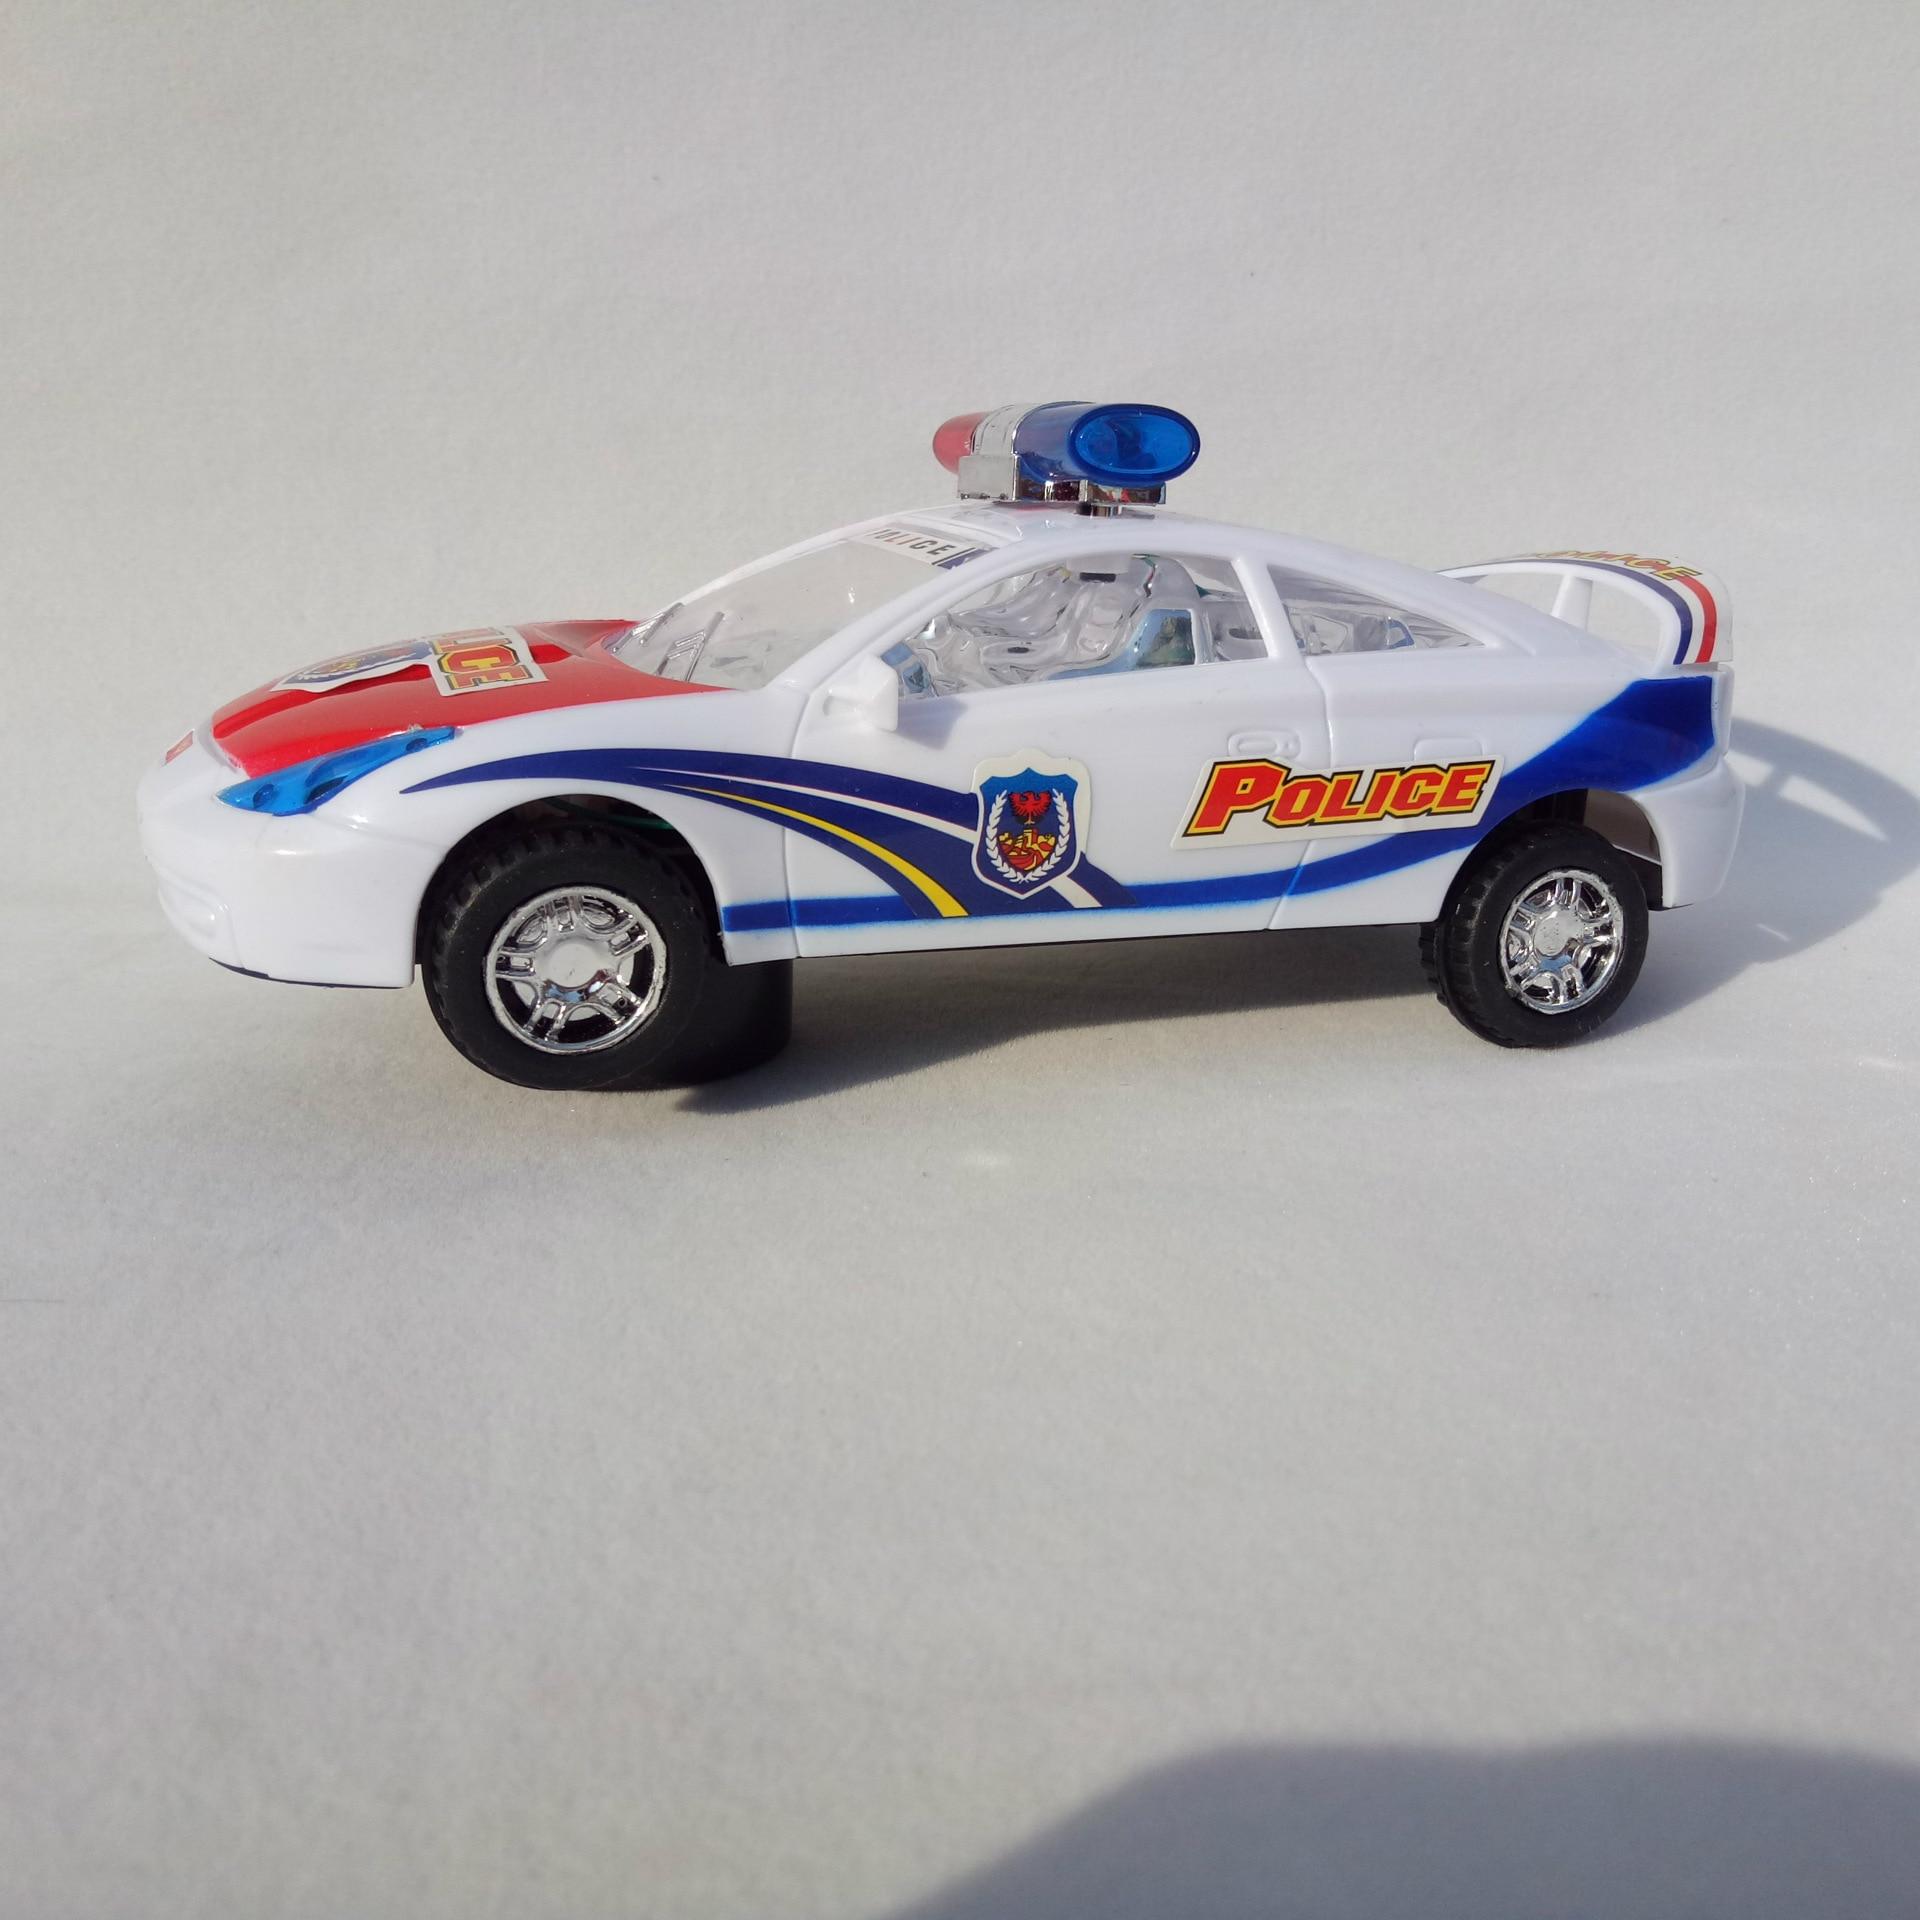 512 Electric Shining Music Police Car Yue Xin Multidirectional Electric Toy Car Flash Songs Nine Yuan